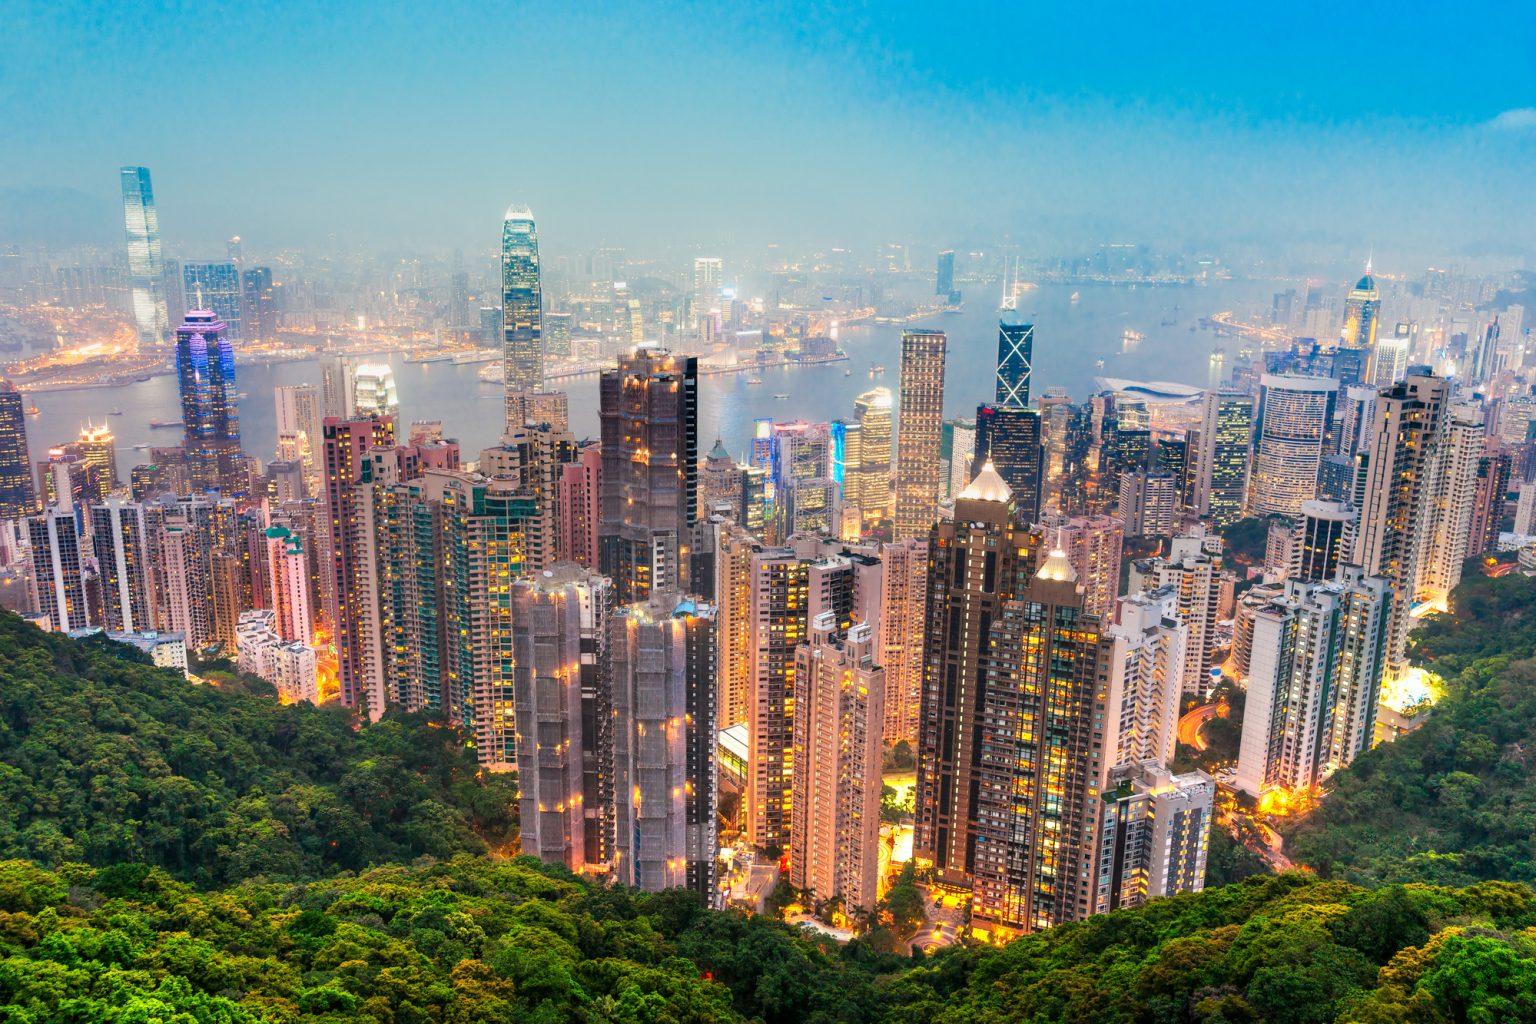 Hongkong lanciert Pilotprogramm mit digitalem Yuan